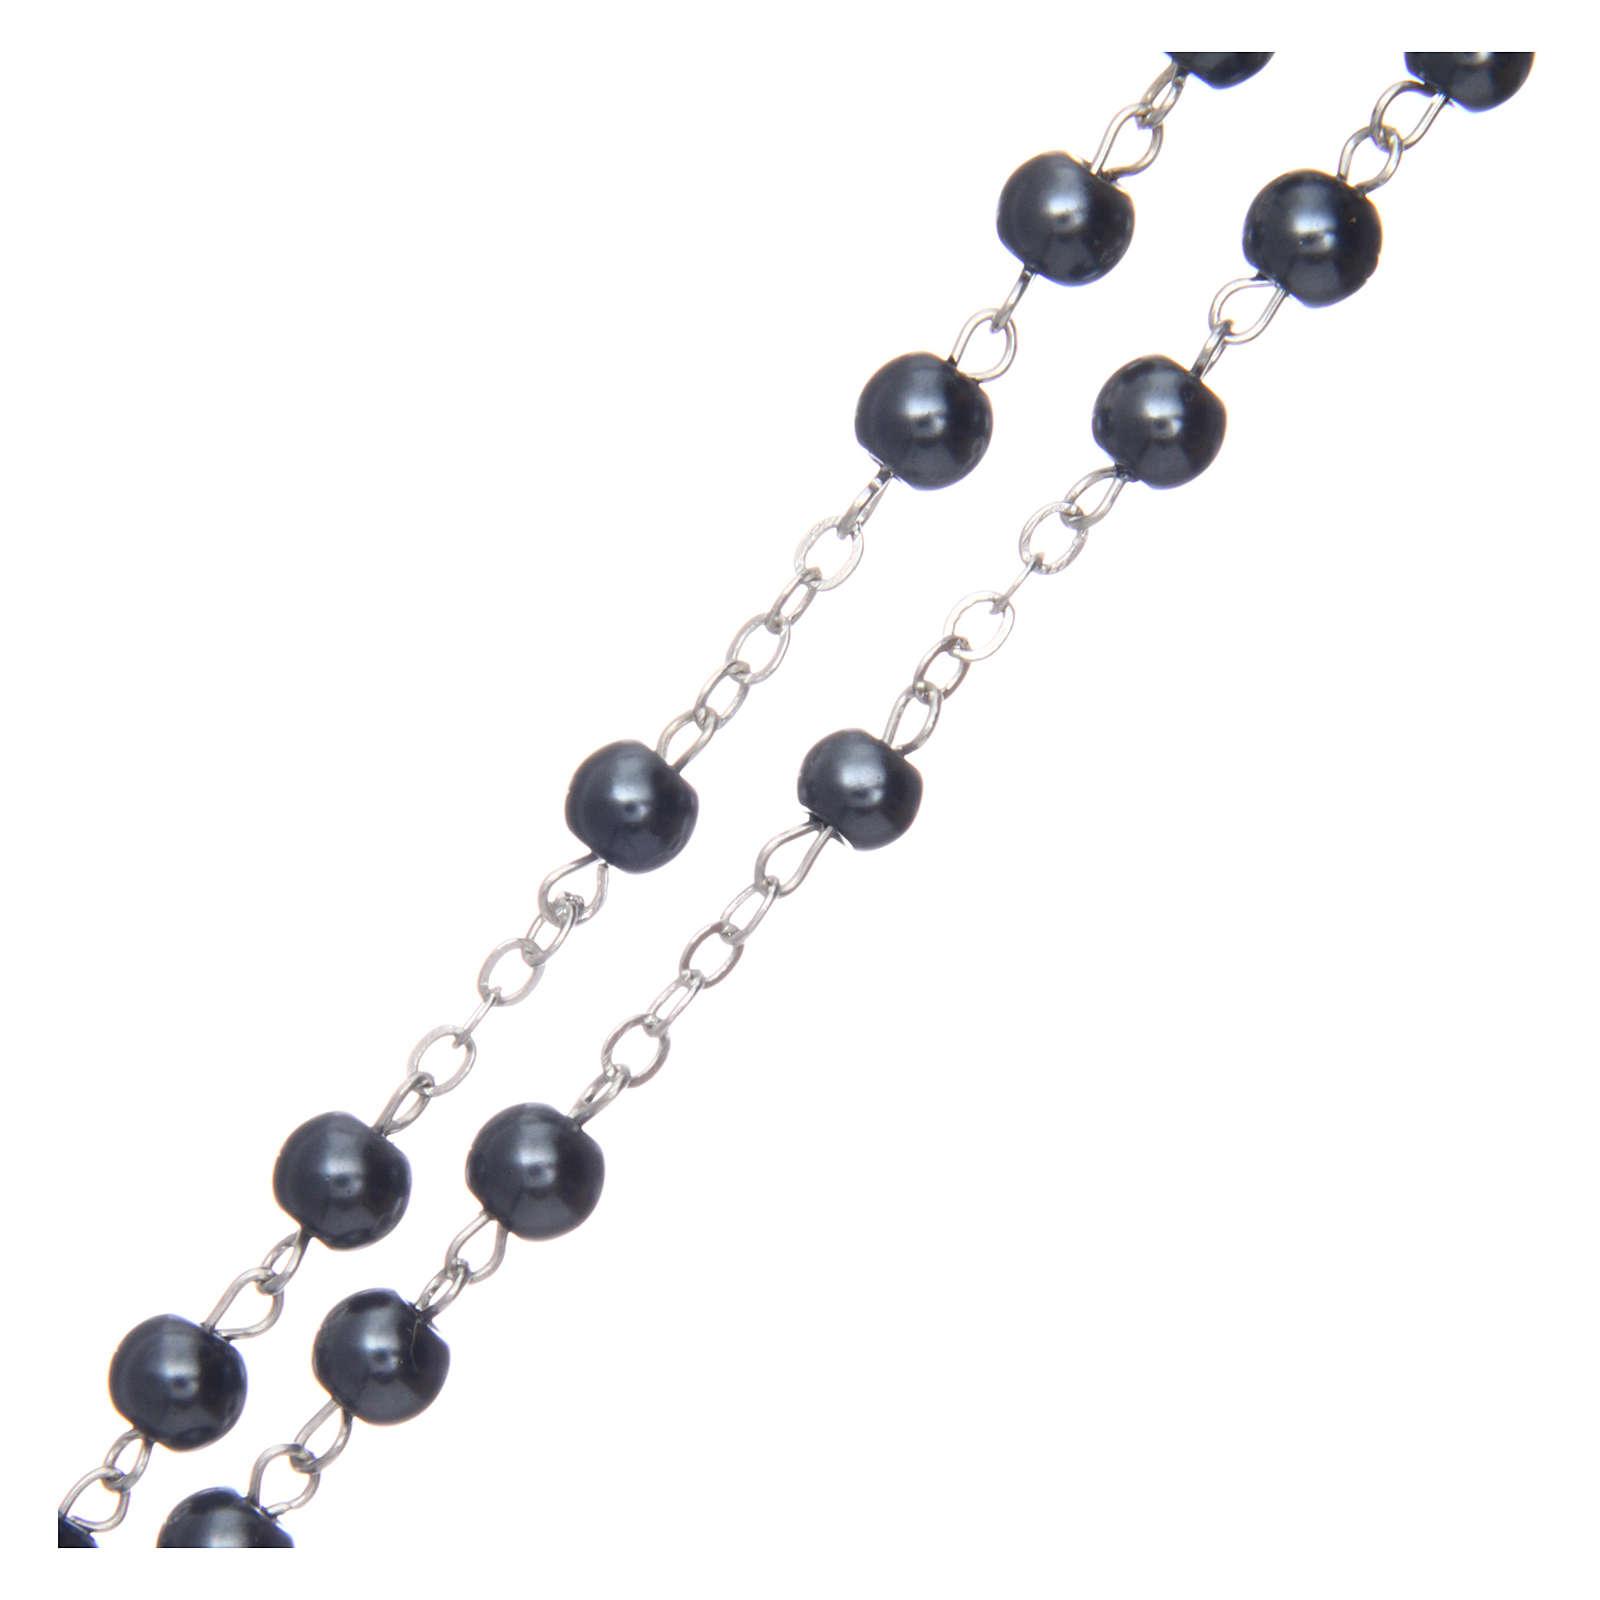 Rosario simil perla redondo hematites 5 mm cruz esmaltada 4